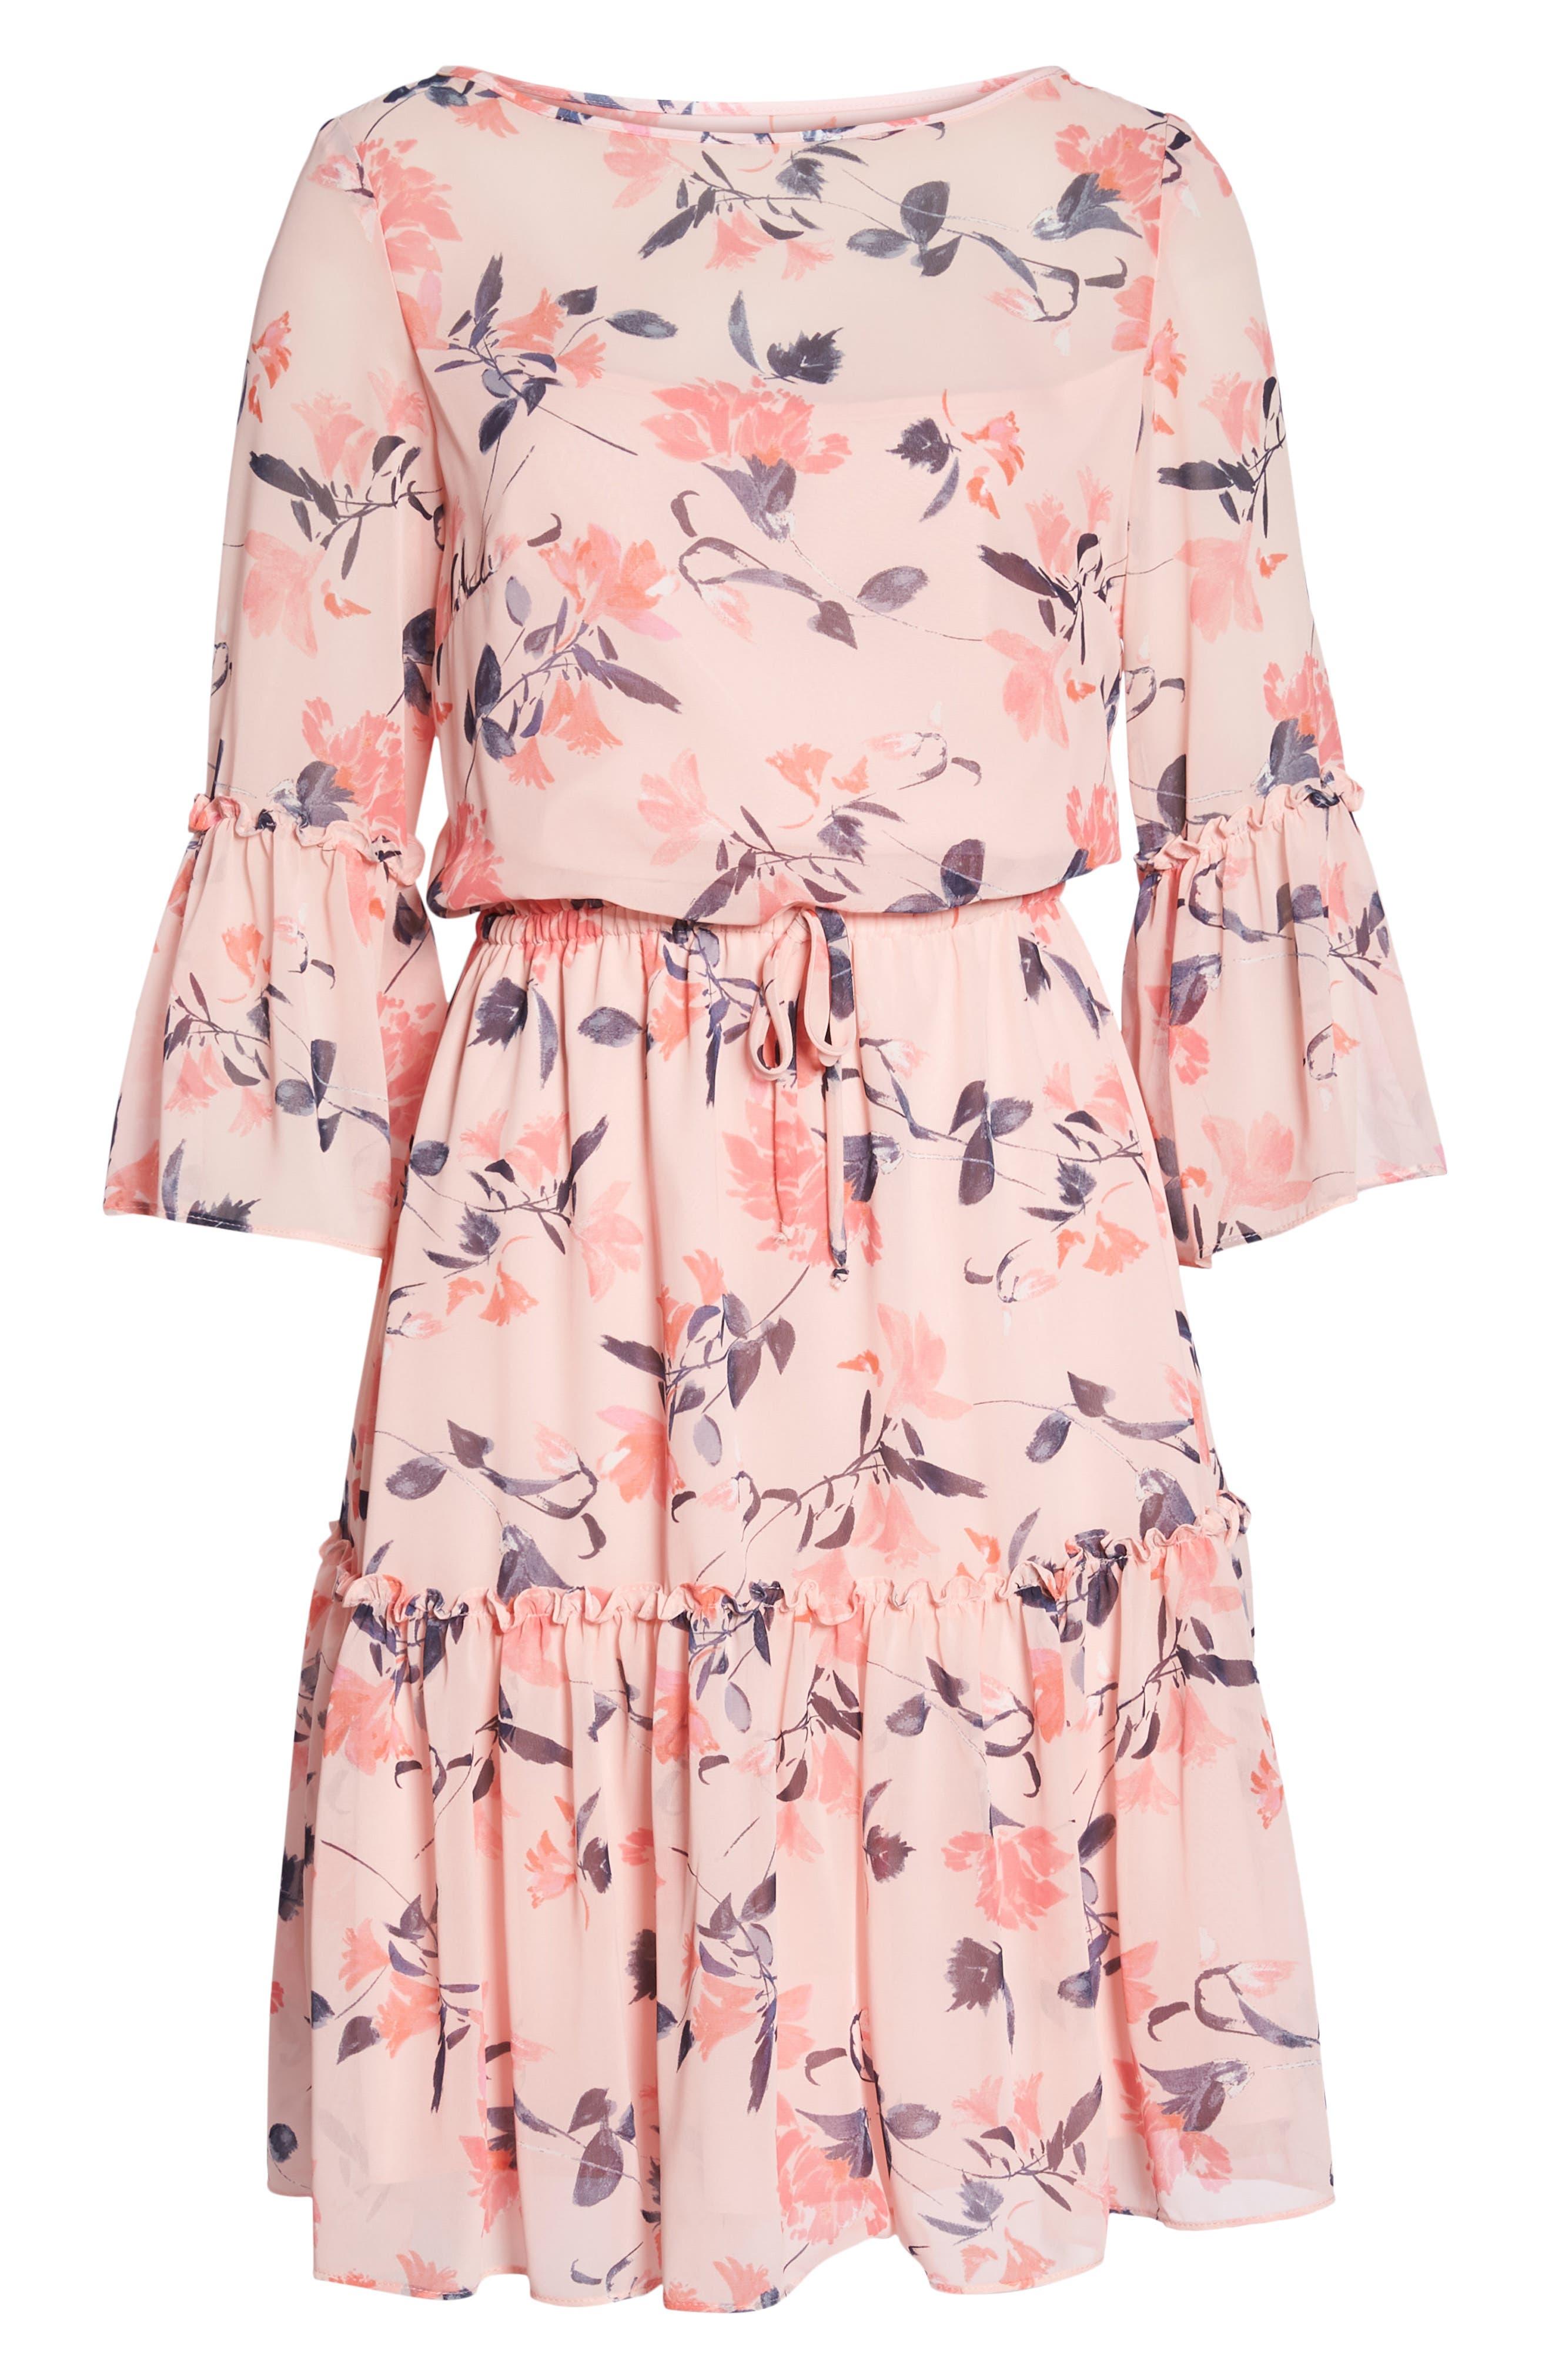 Floral Bell Sleeve Chiffon Dress,                             Alternate thumbnail 7, color,                             Blush